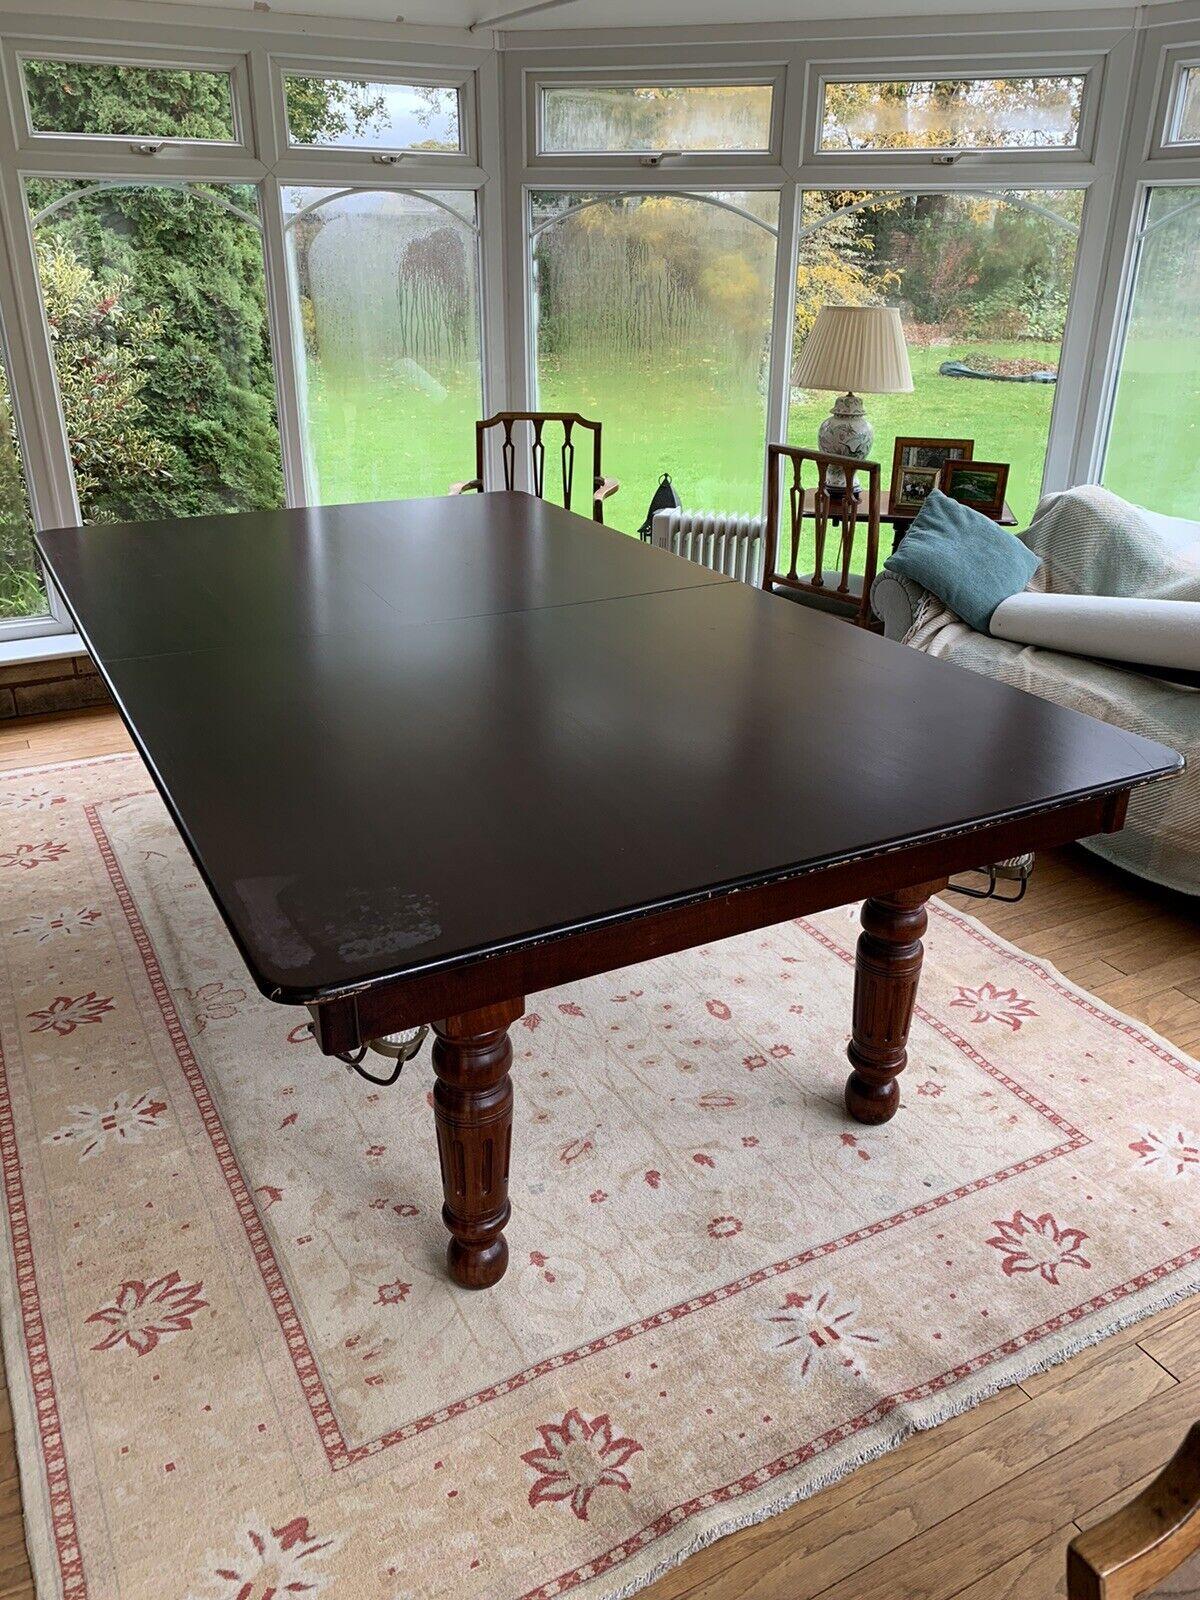 Snooker Dining Table Mahogany 7'6 x 4 Slate Pool Set